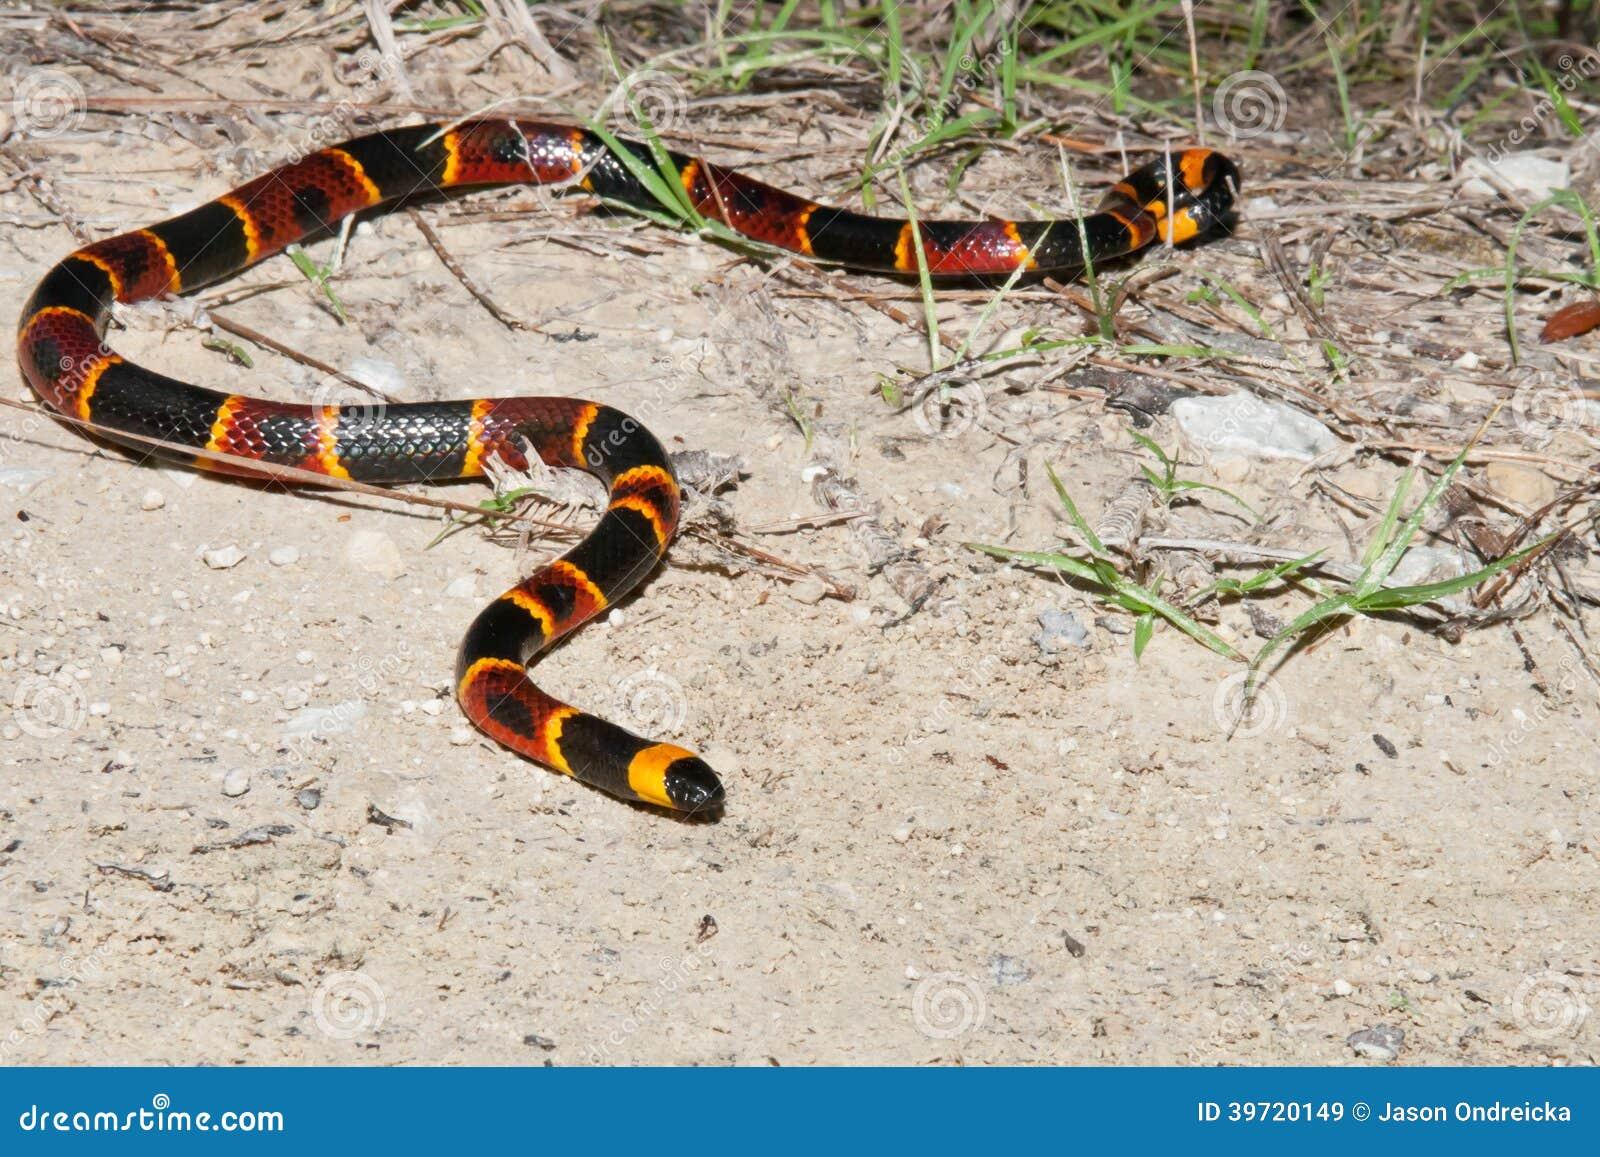 Oostelijke Coral Snake